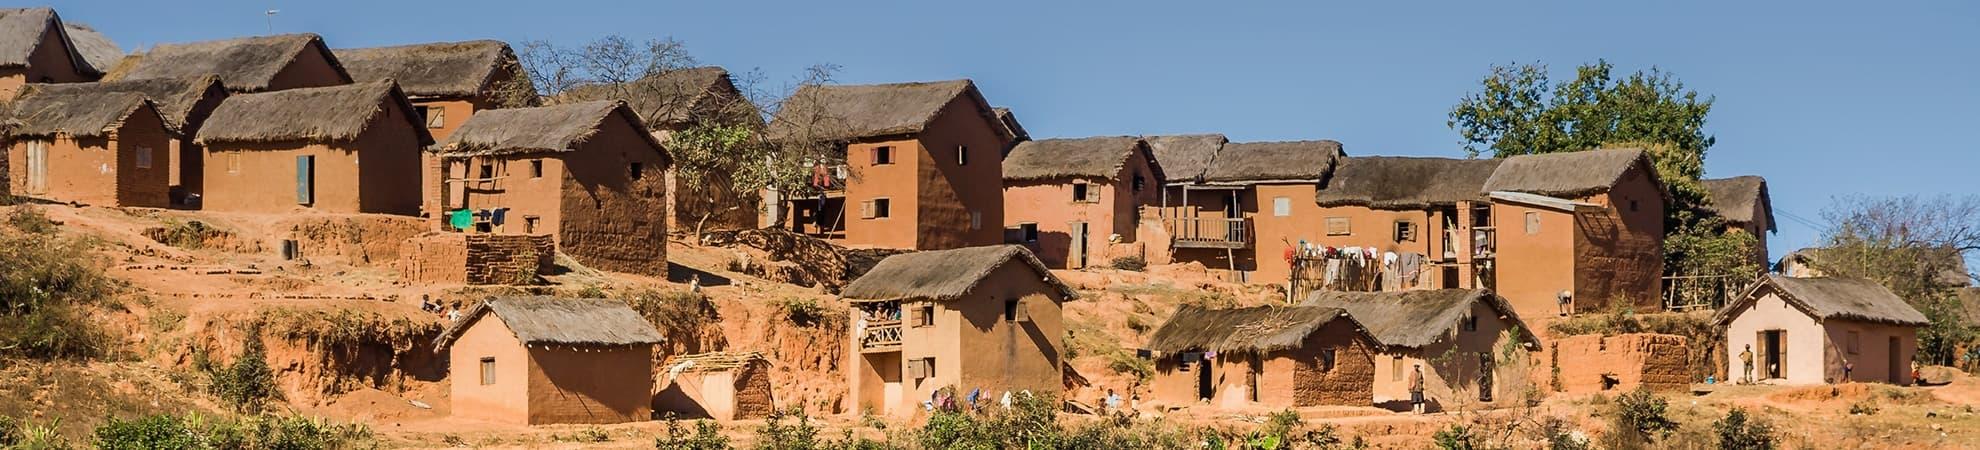 Thématique Madagascar